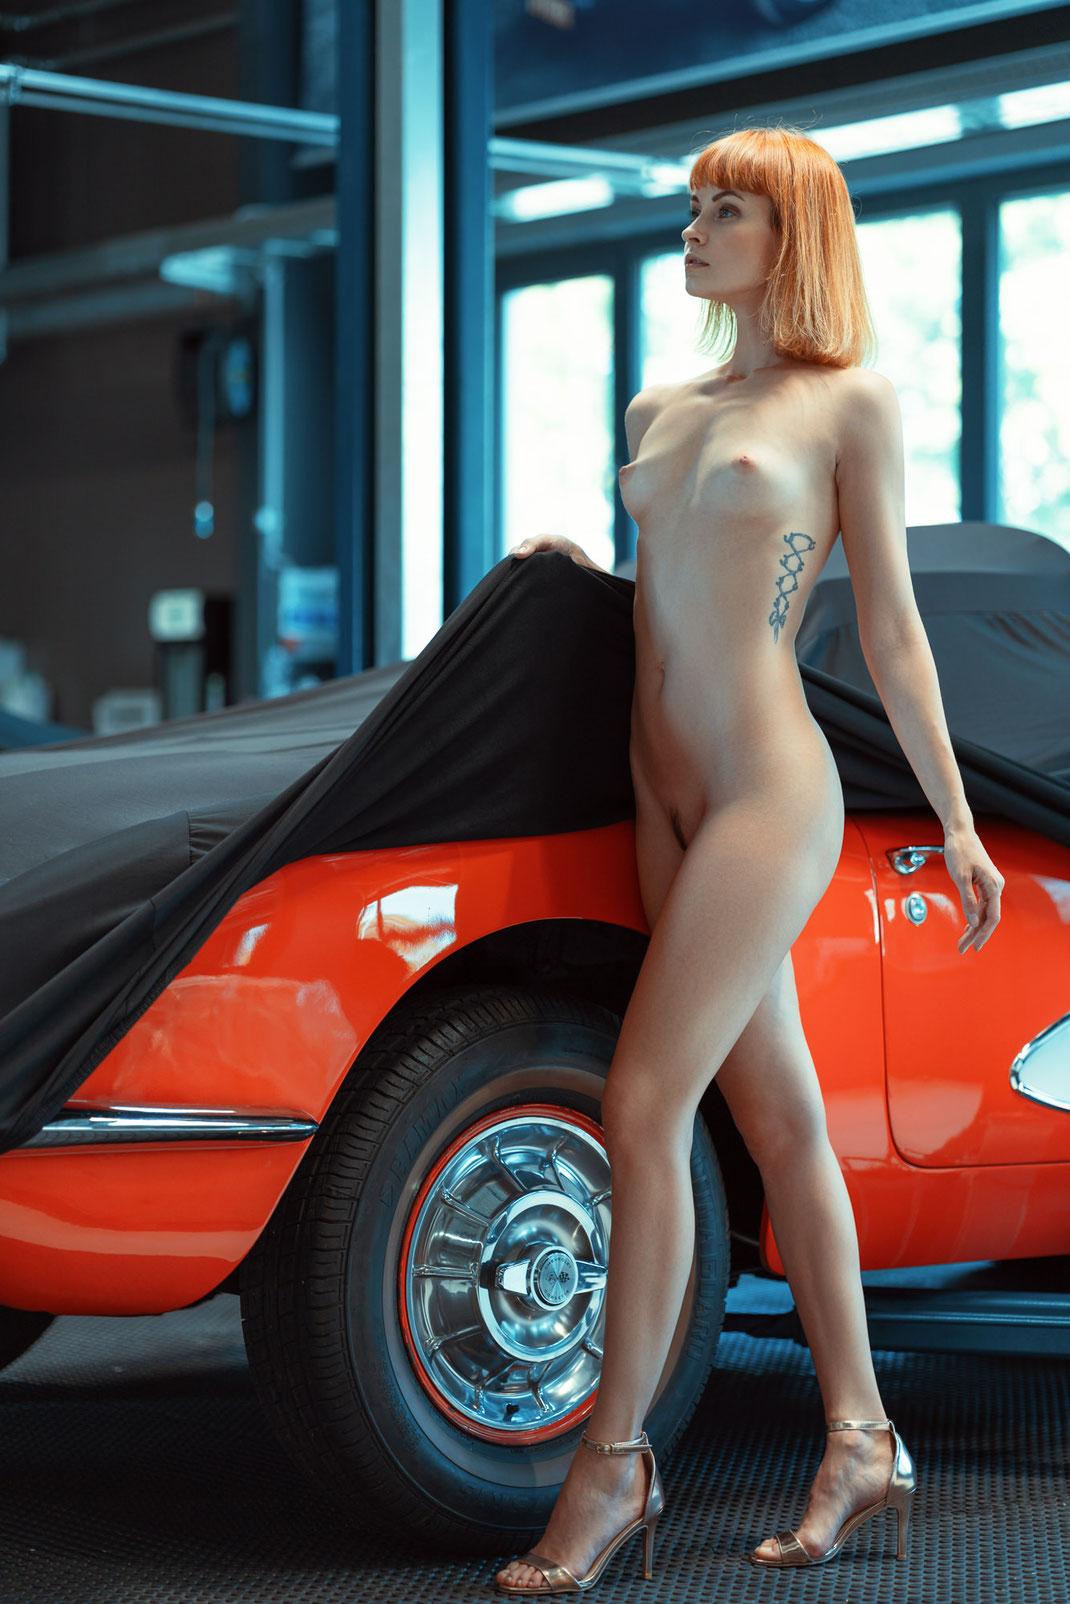 Ambition is a dream with a V8 engine (Elvis Presley) - Zuzanna - Markus Hertzsch - Chevrolet Corvette C1 - V8 - Car - Model - Girl - Portrait -  Look - BW - Mustang - Classiccar - Oldtimer